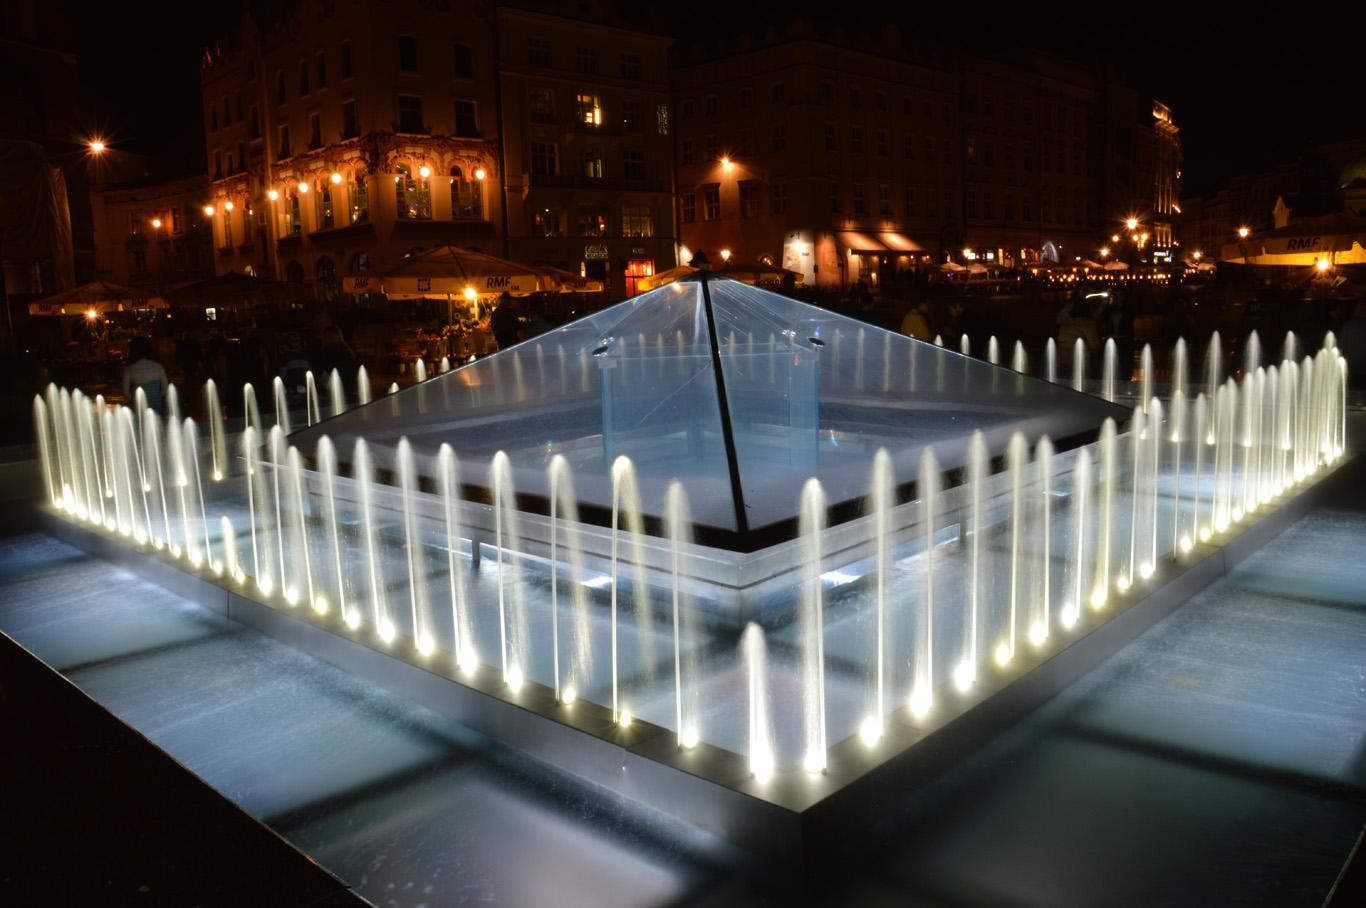 A fountain in the market square